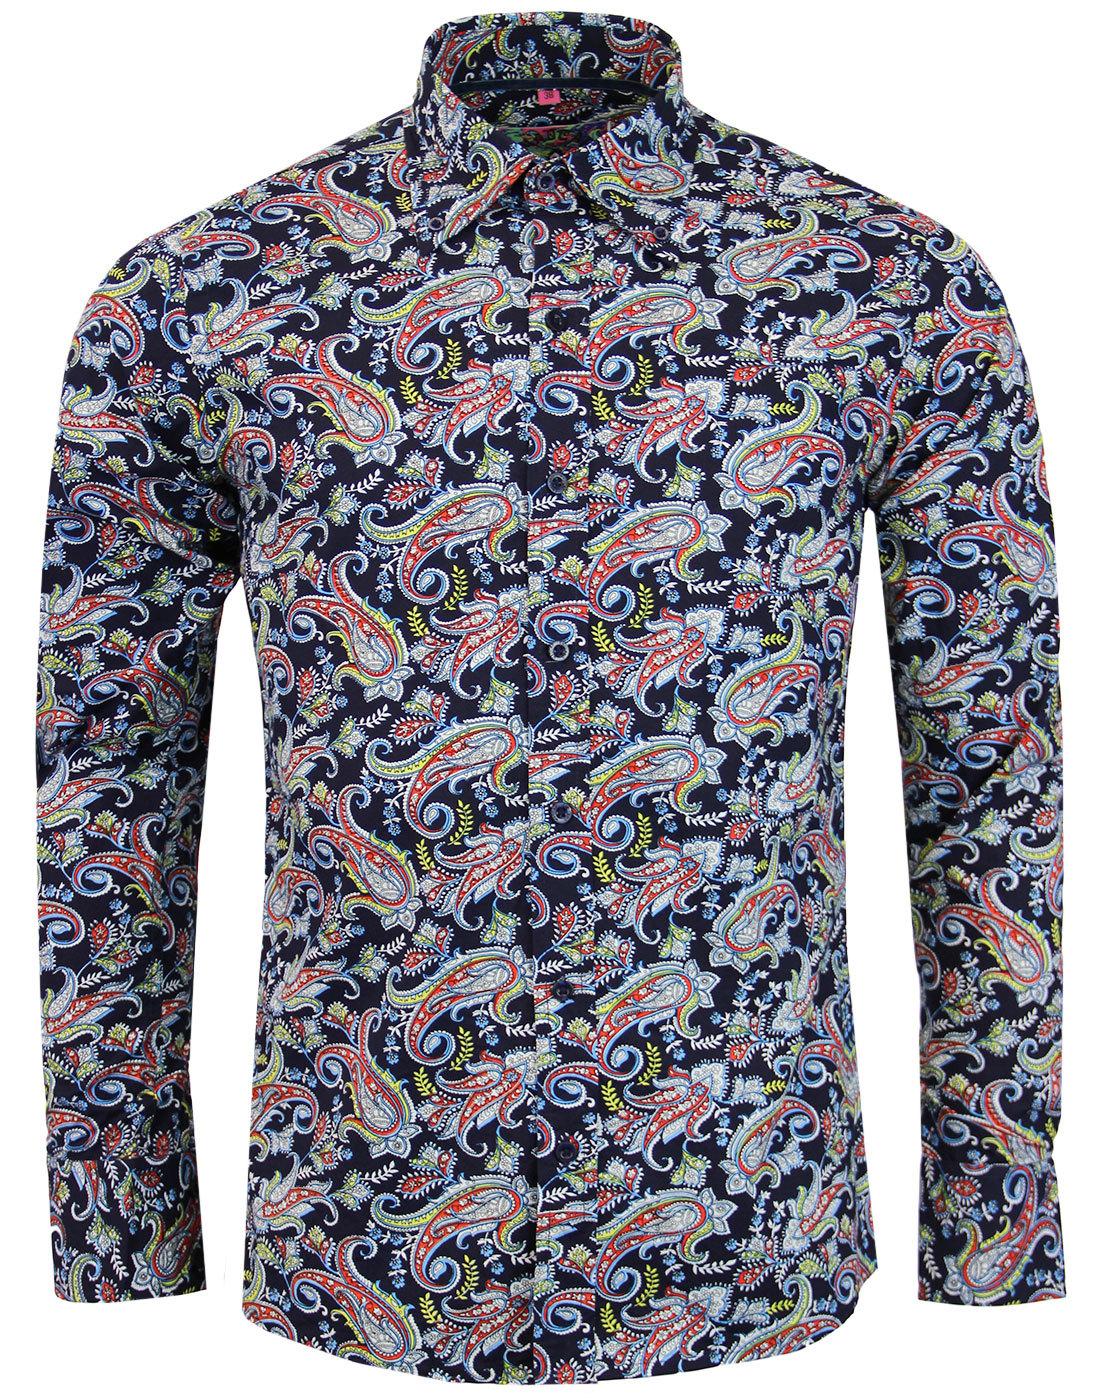 madcap england tabla paisley 1960s mod shirt navy